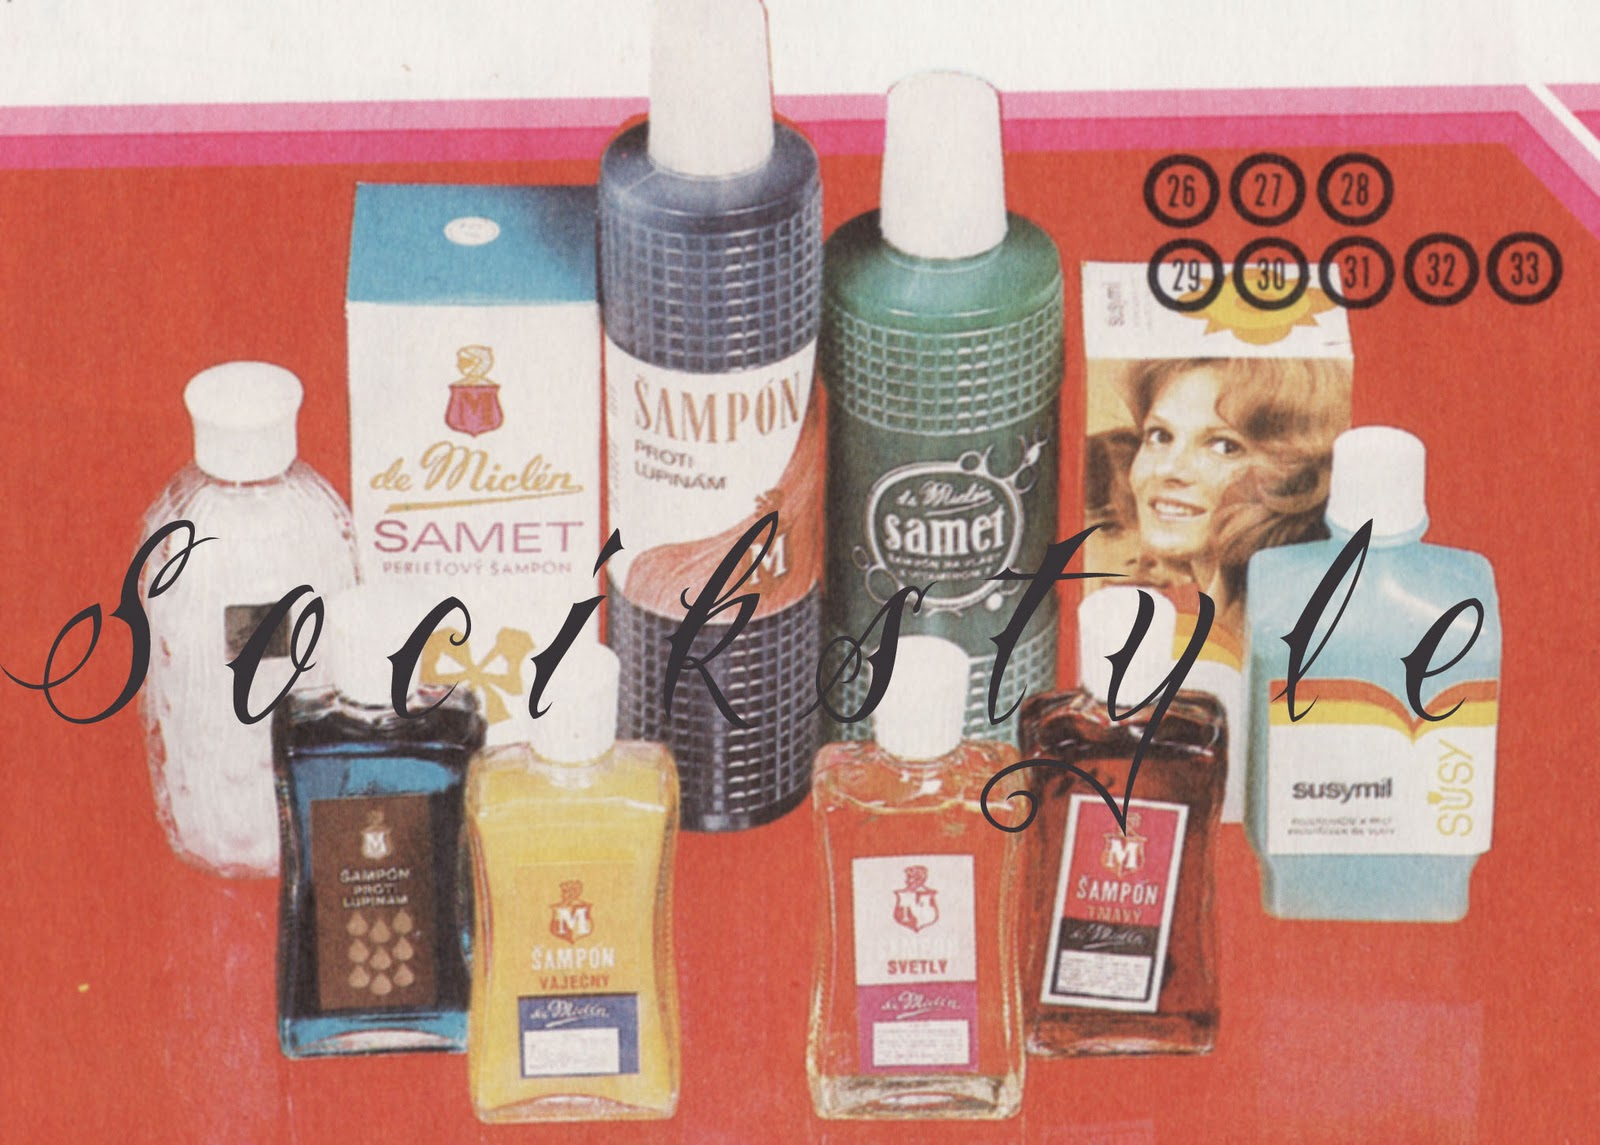 Soc k style ostalgia eskoslovensk kozmetika for Ka che vintage look